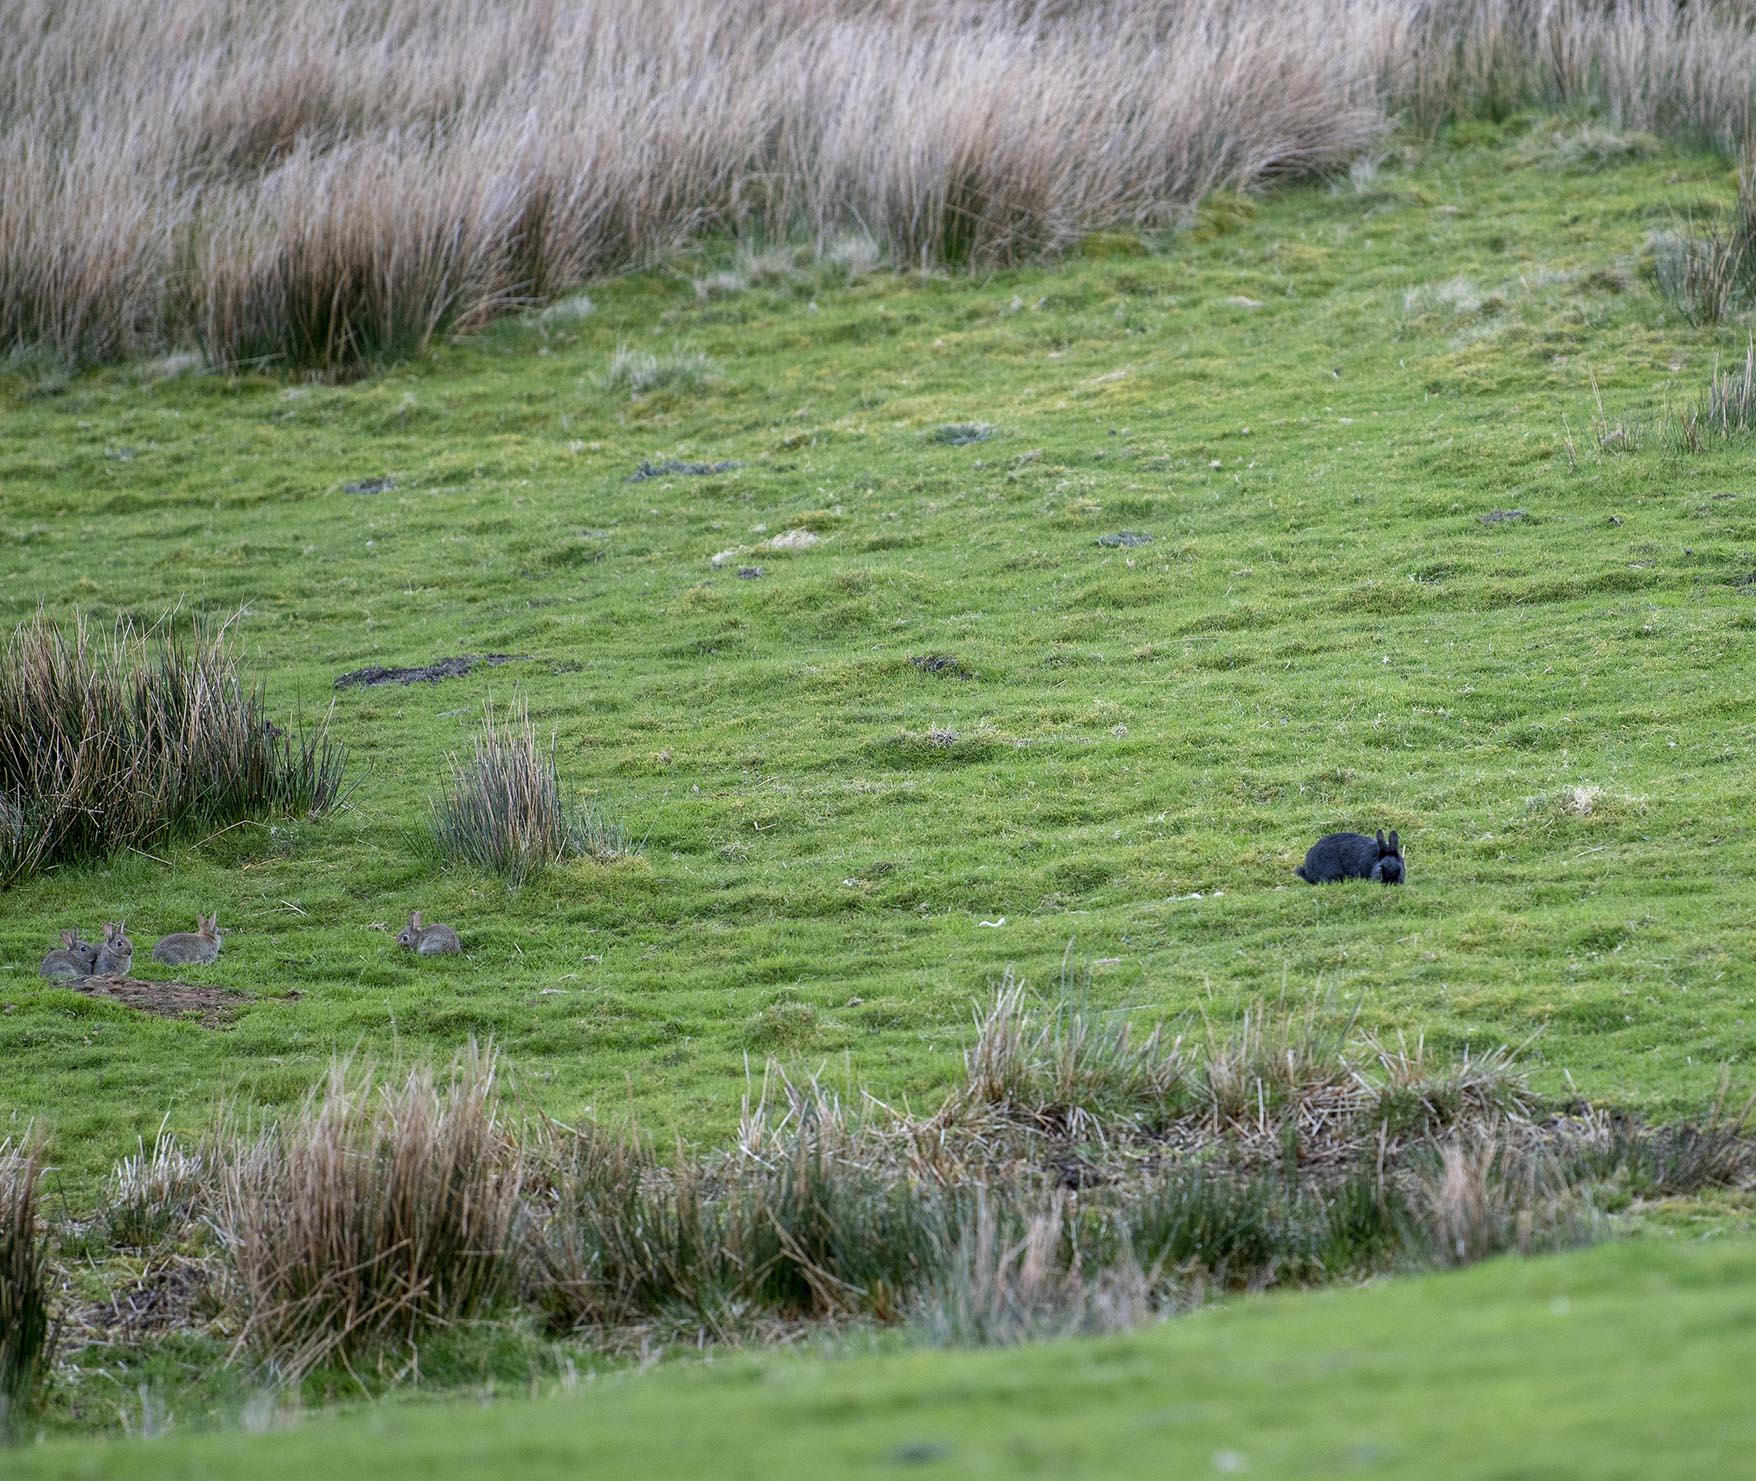 Black and agouti wild rabbits